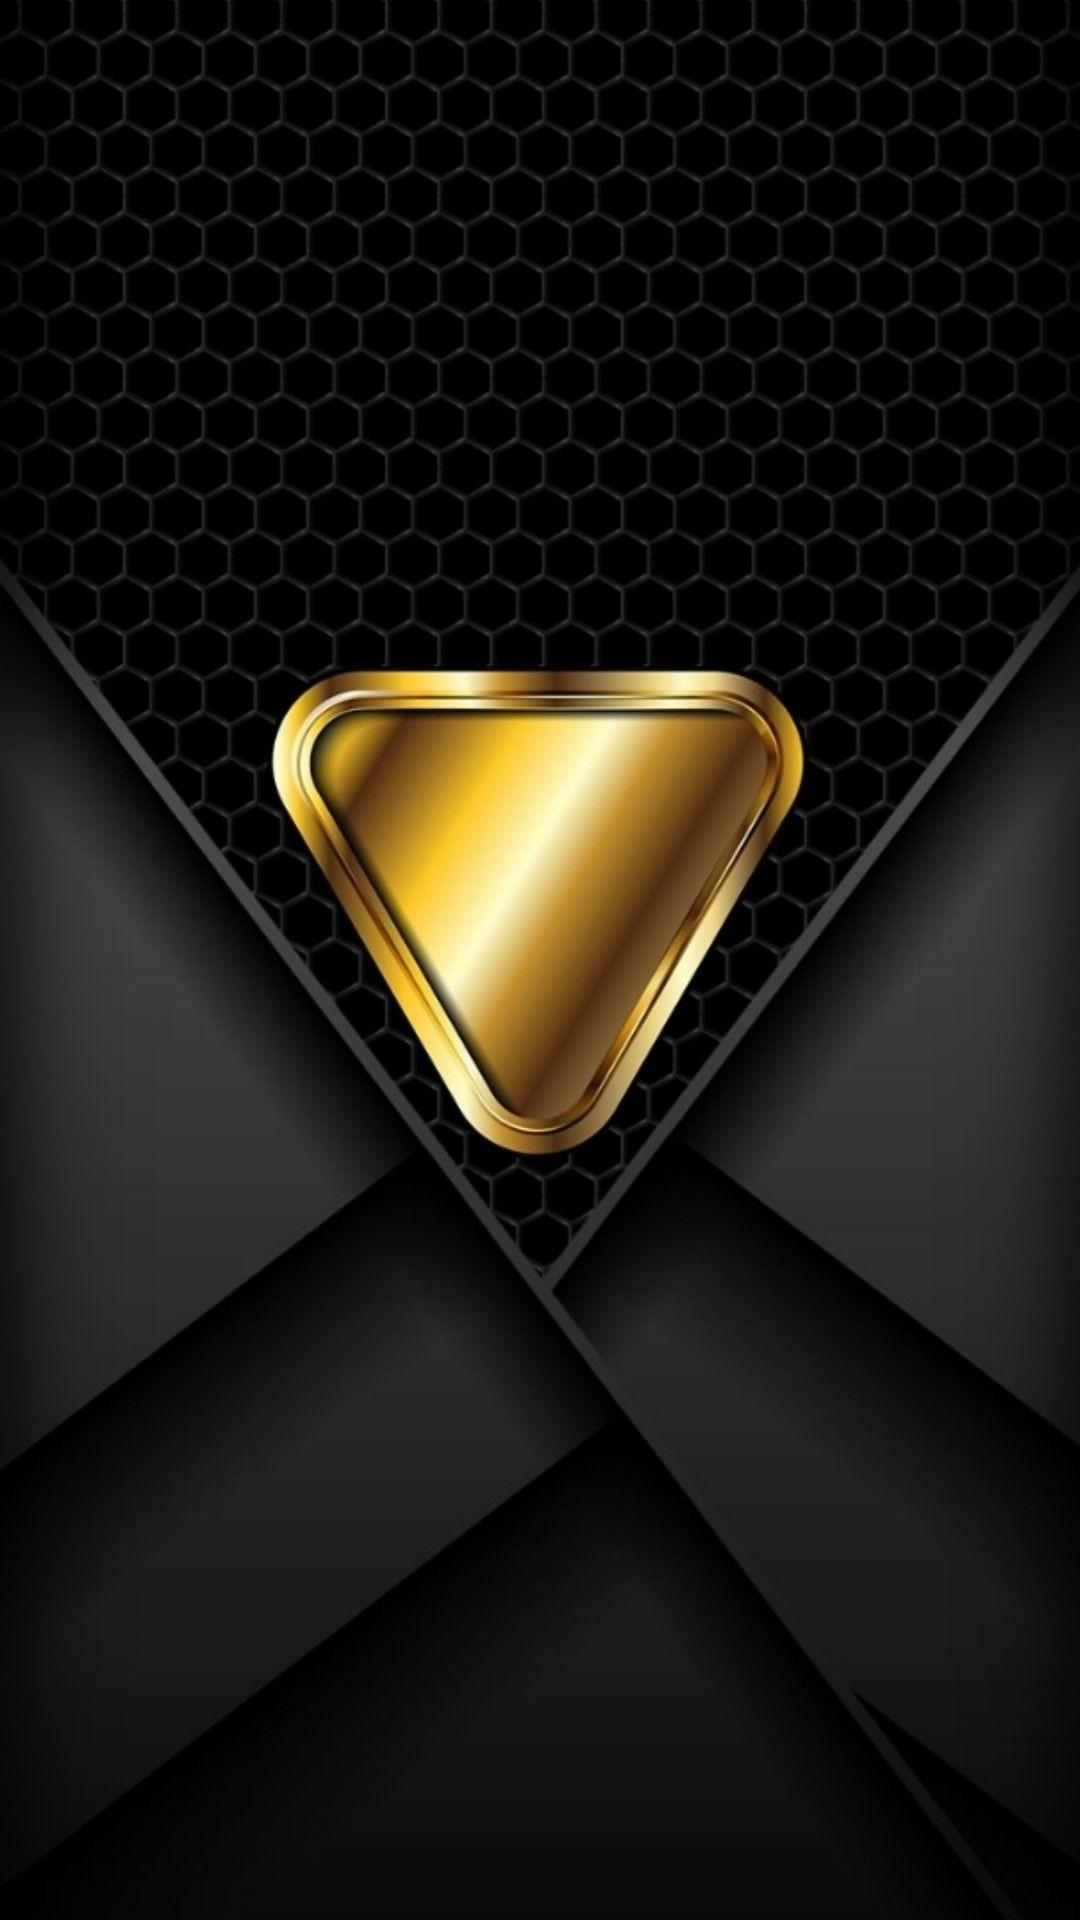 Gold iPhone 5 wallpaper